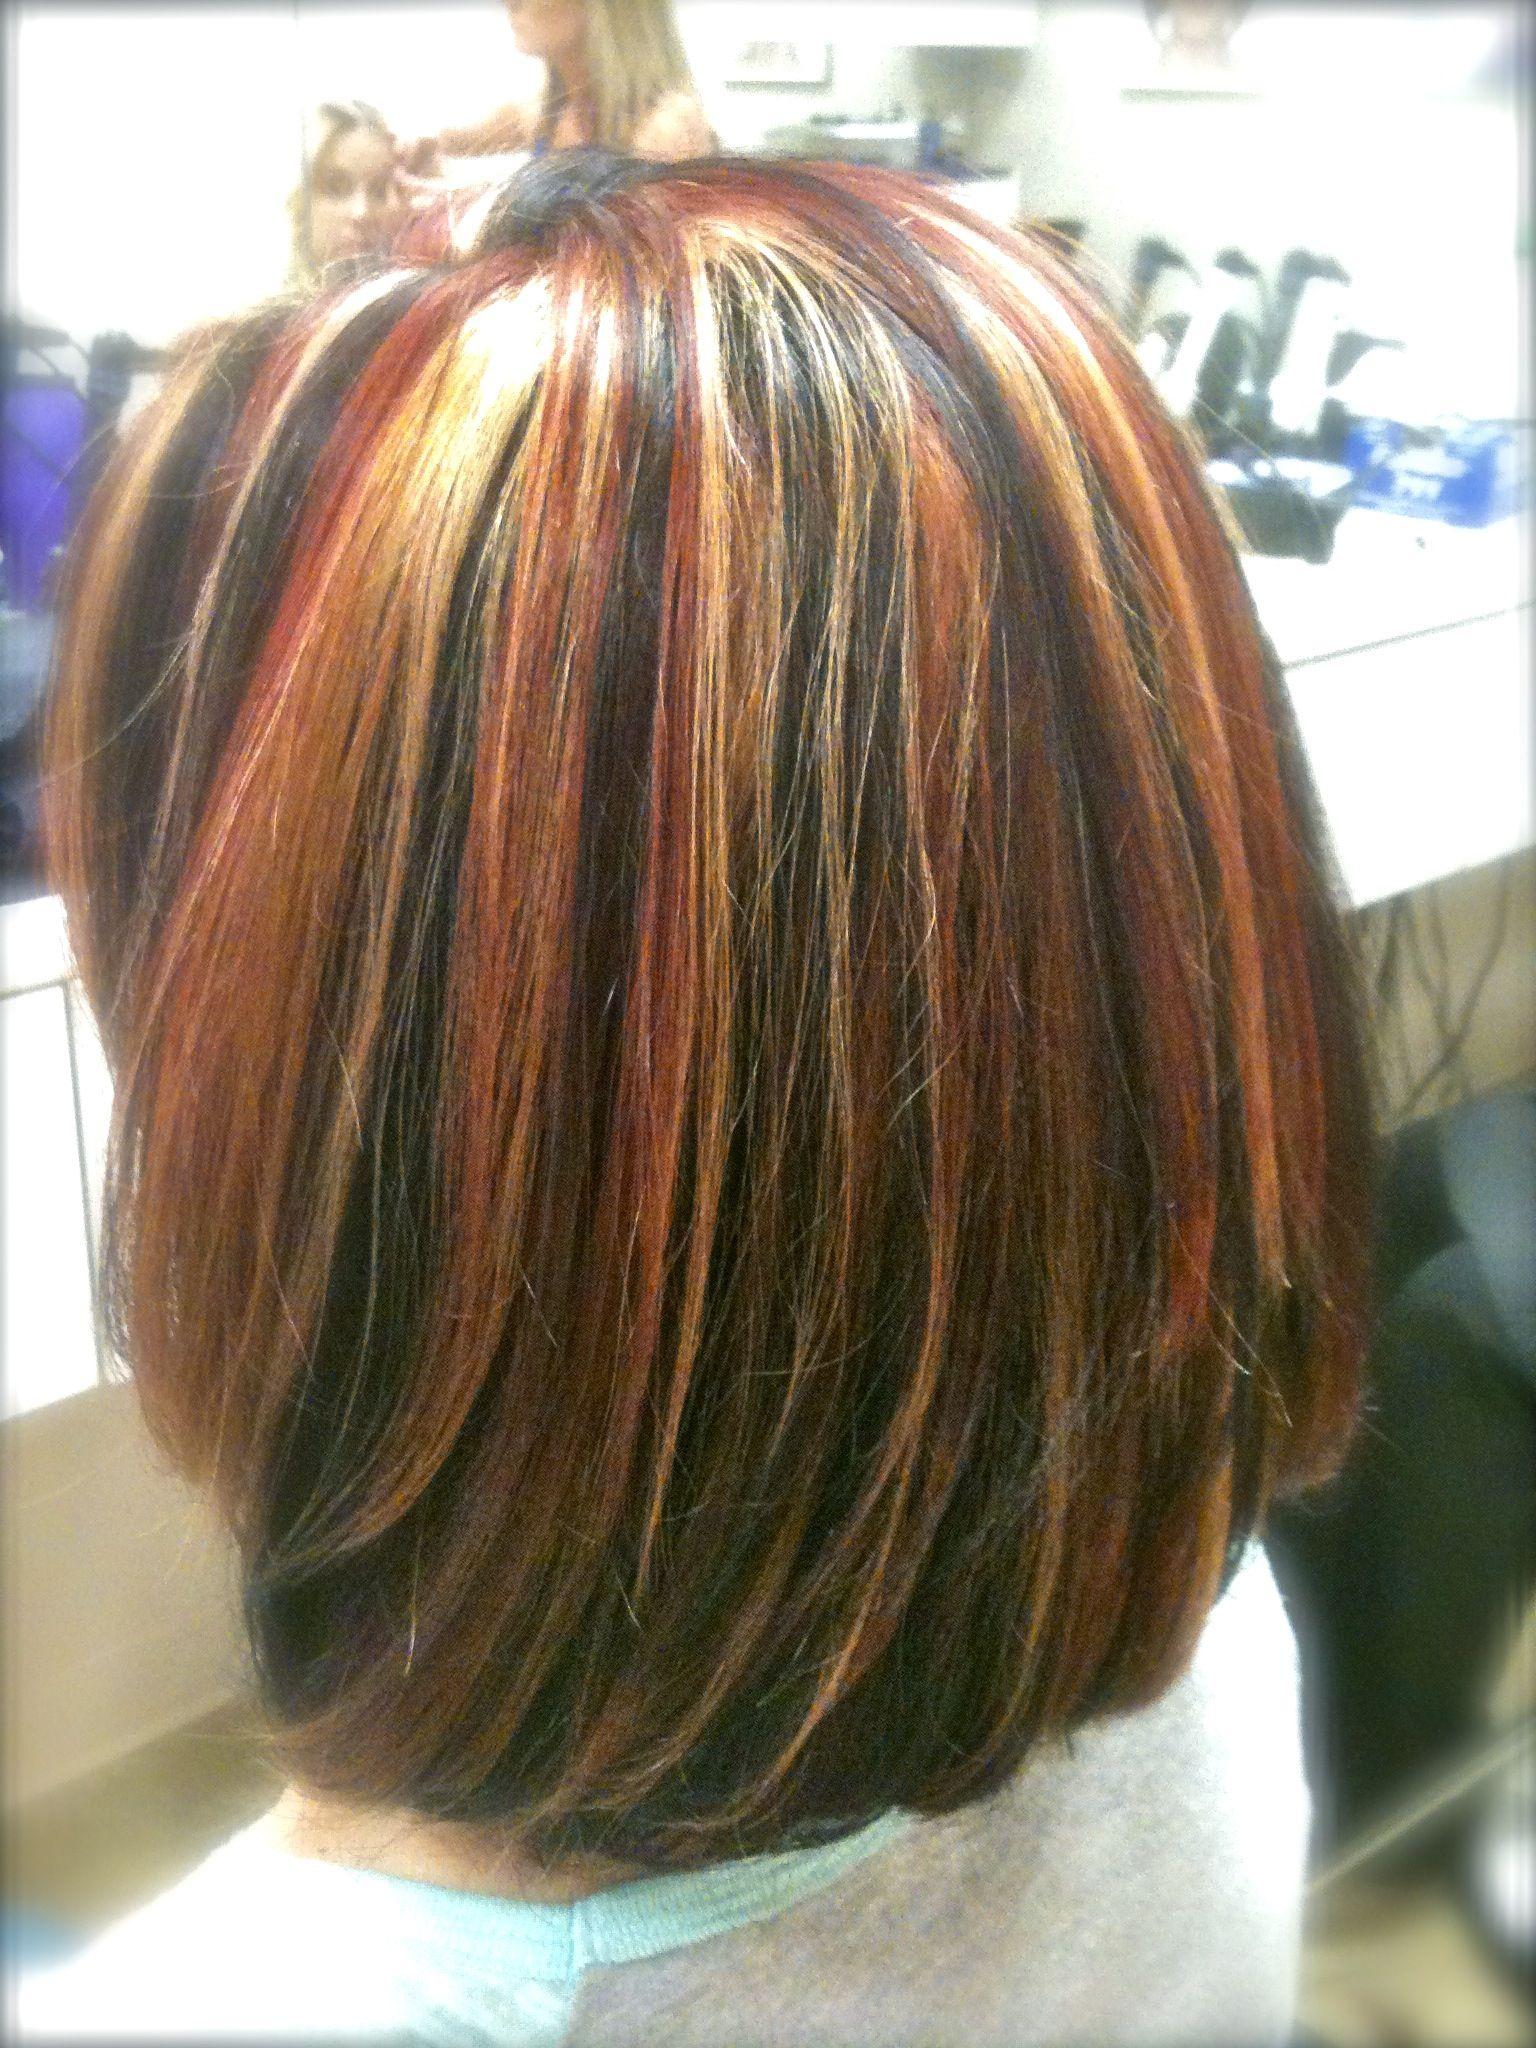 Tri Color Highlights On Shoulder Length Hair Stylist